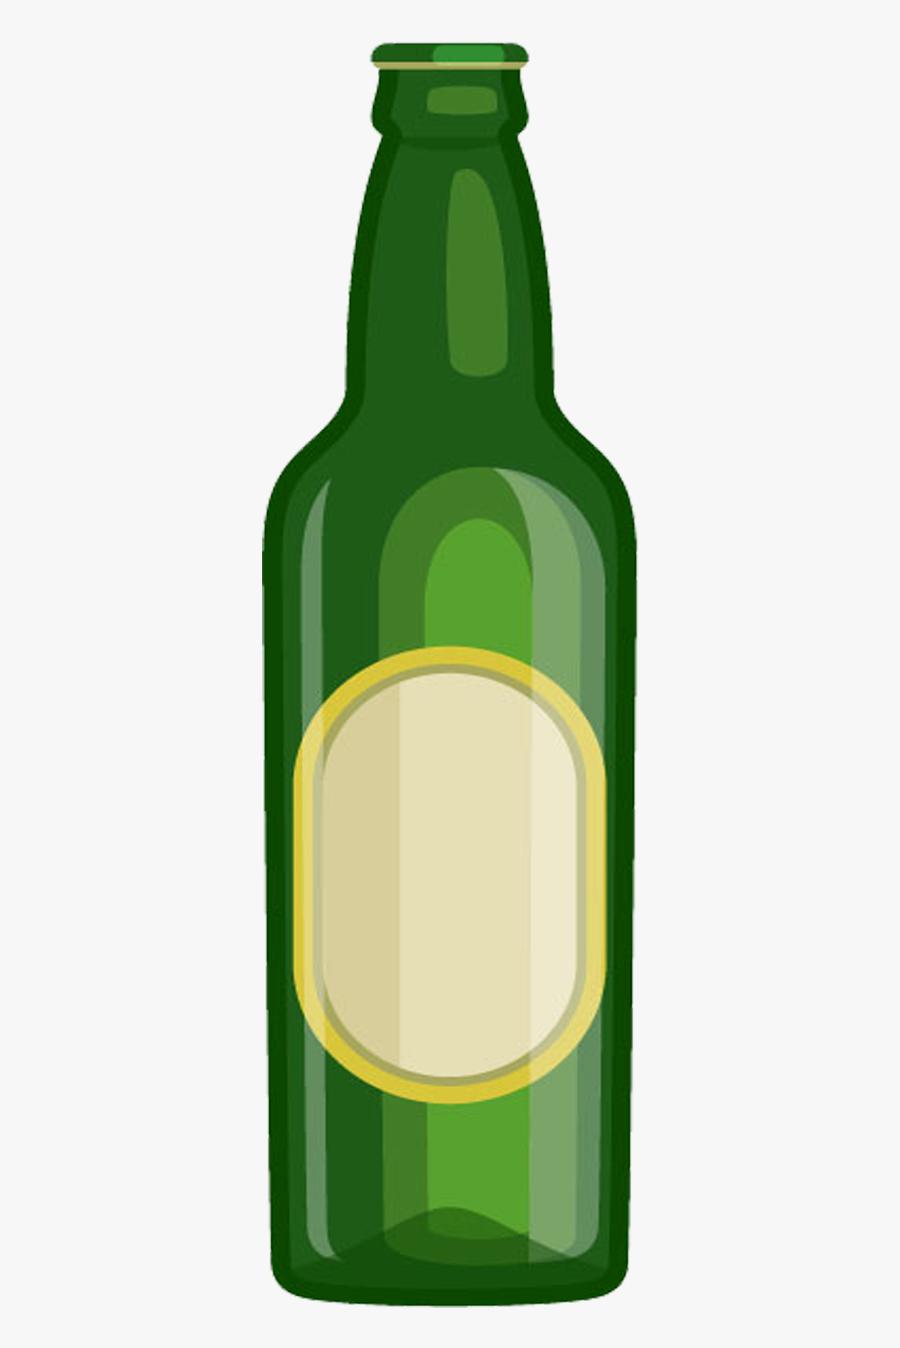 Graffiti Beer Bottle , Free Transparent Clipart.